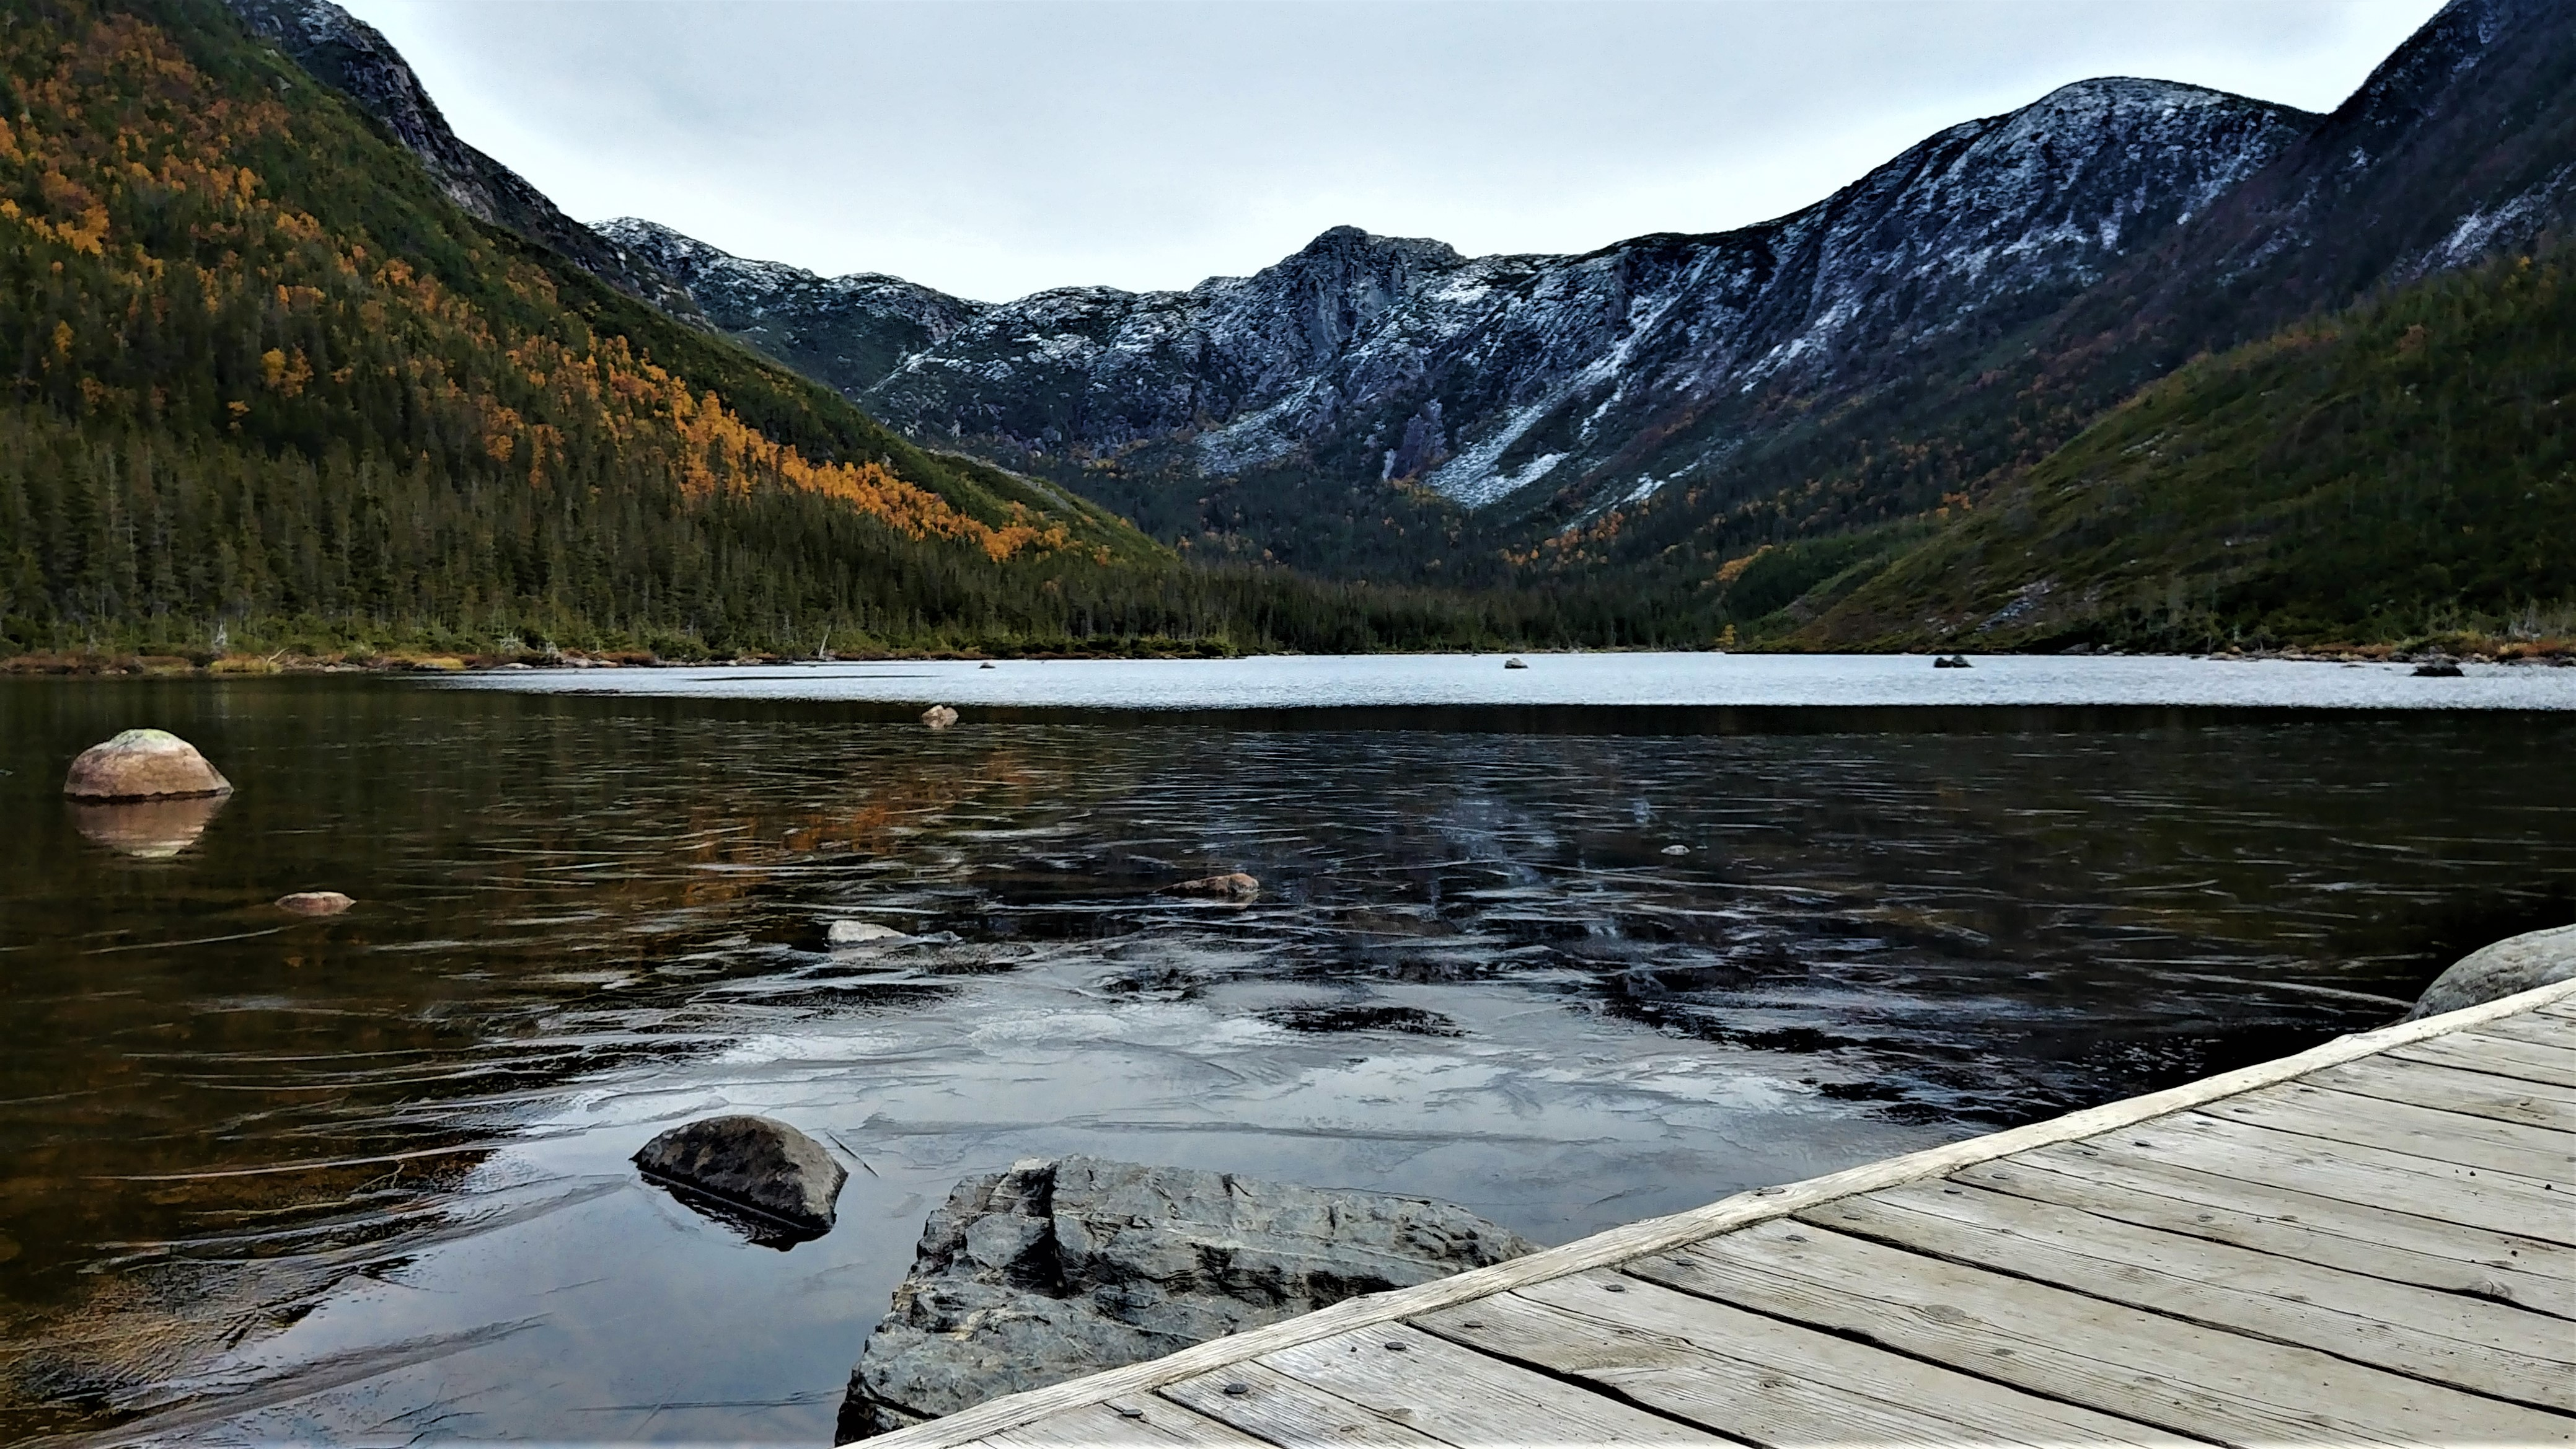 randonnee facile parc national gaspesie lac aux americains road-trip canada infos pratiques arpenter le chemin